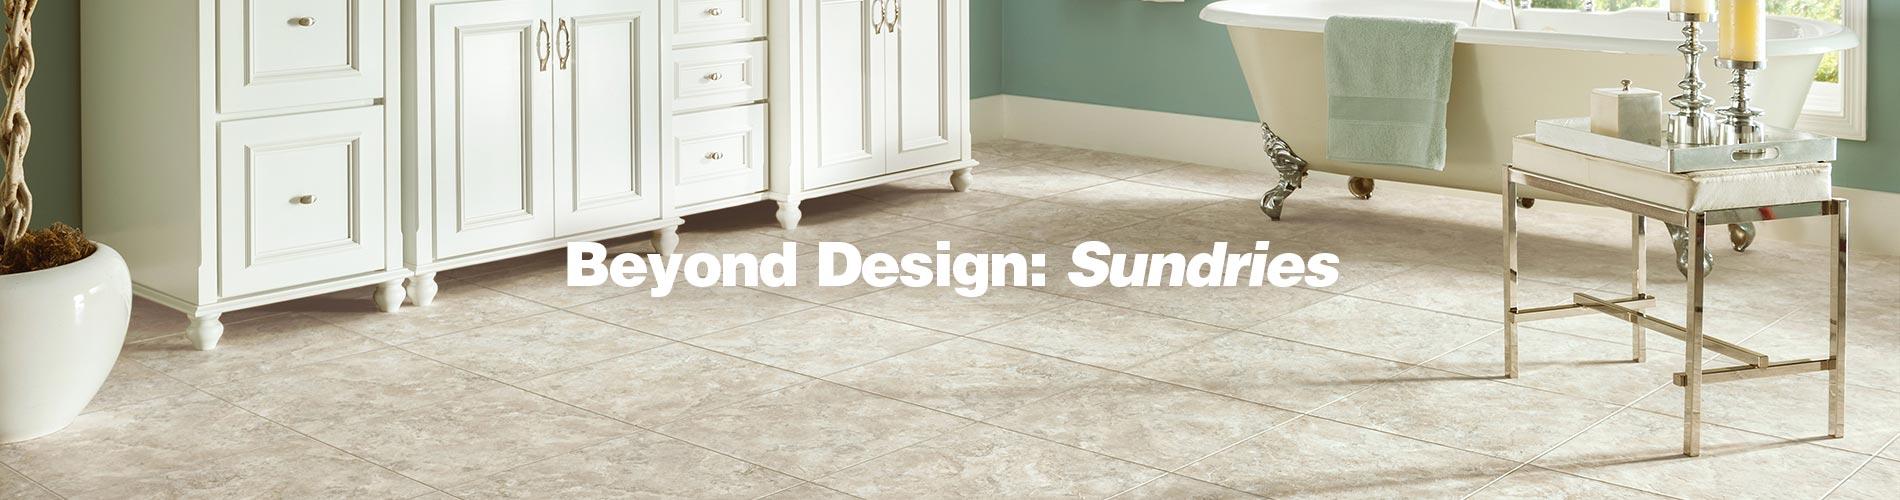 Beyond Design: Sundries